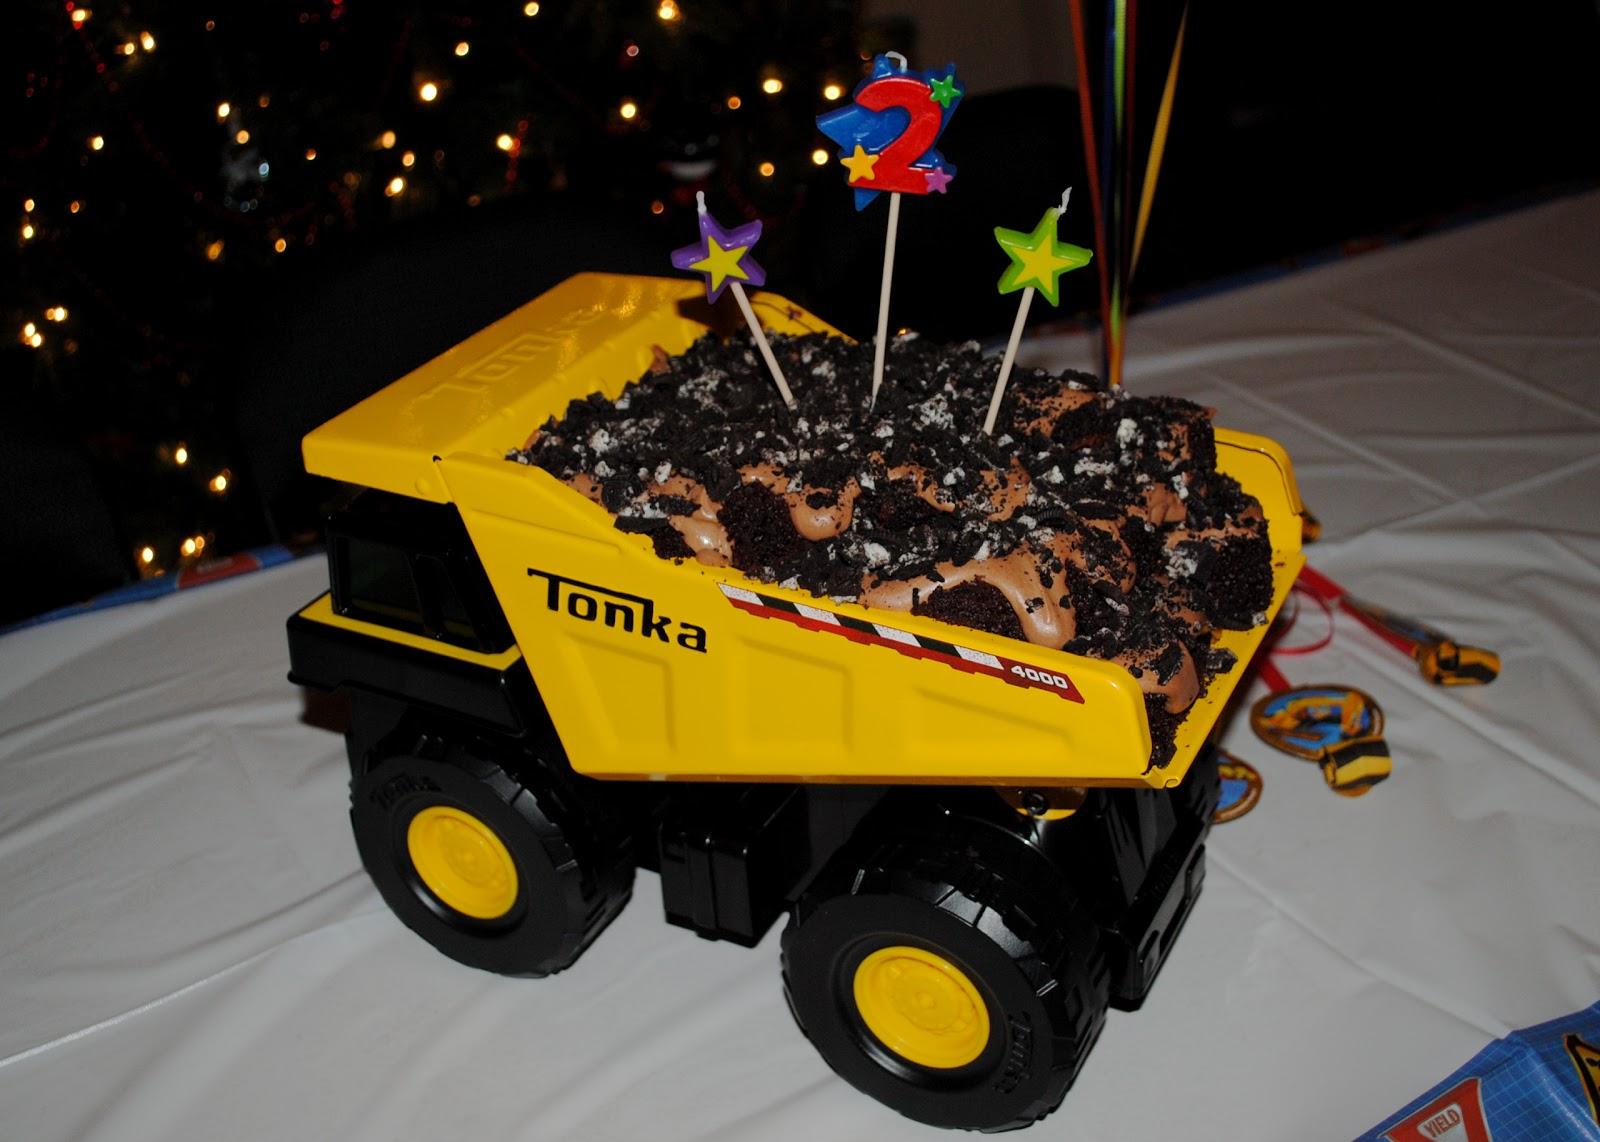 Truck Birthday Cakes